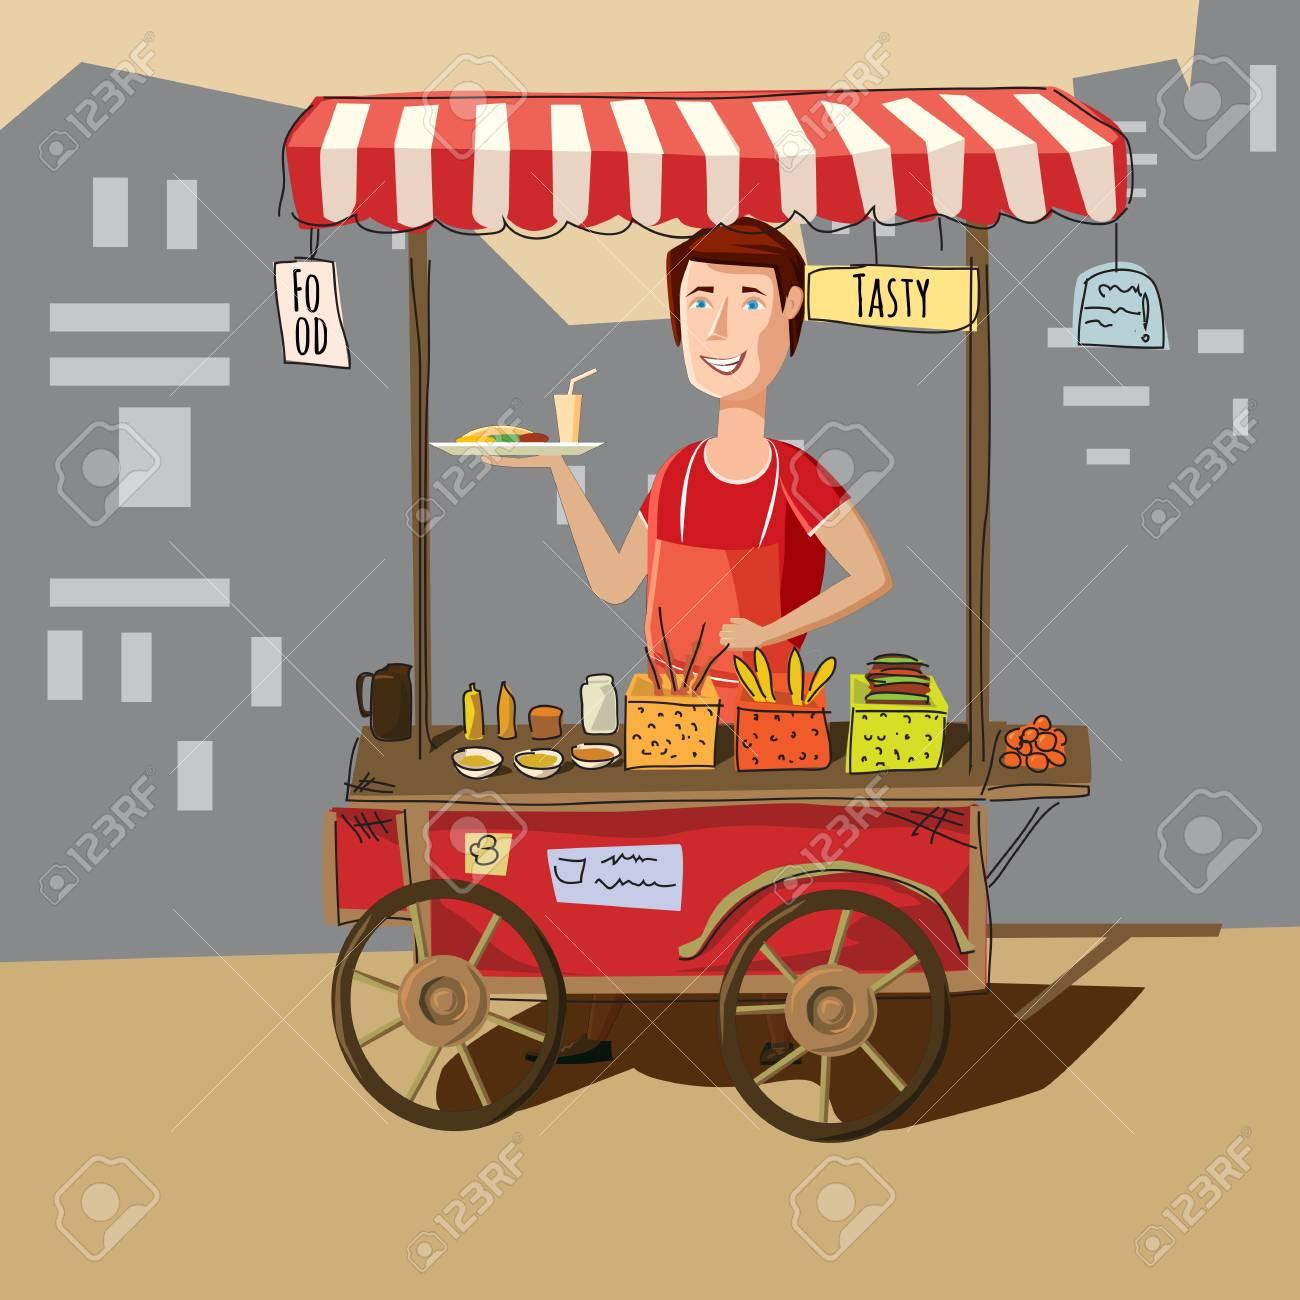 Street food truck street vendor in cartoon style vector illustration. - 75847261